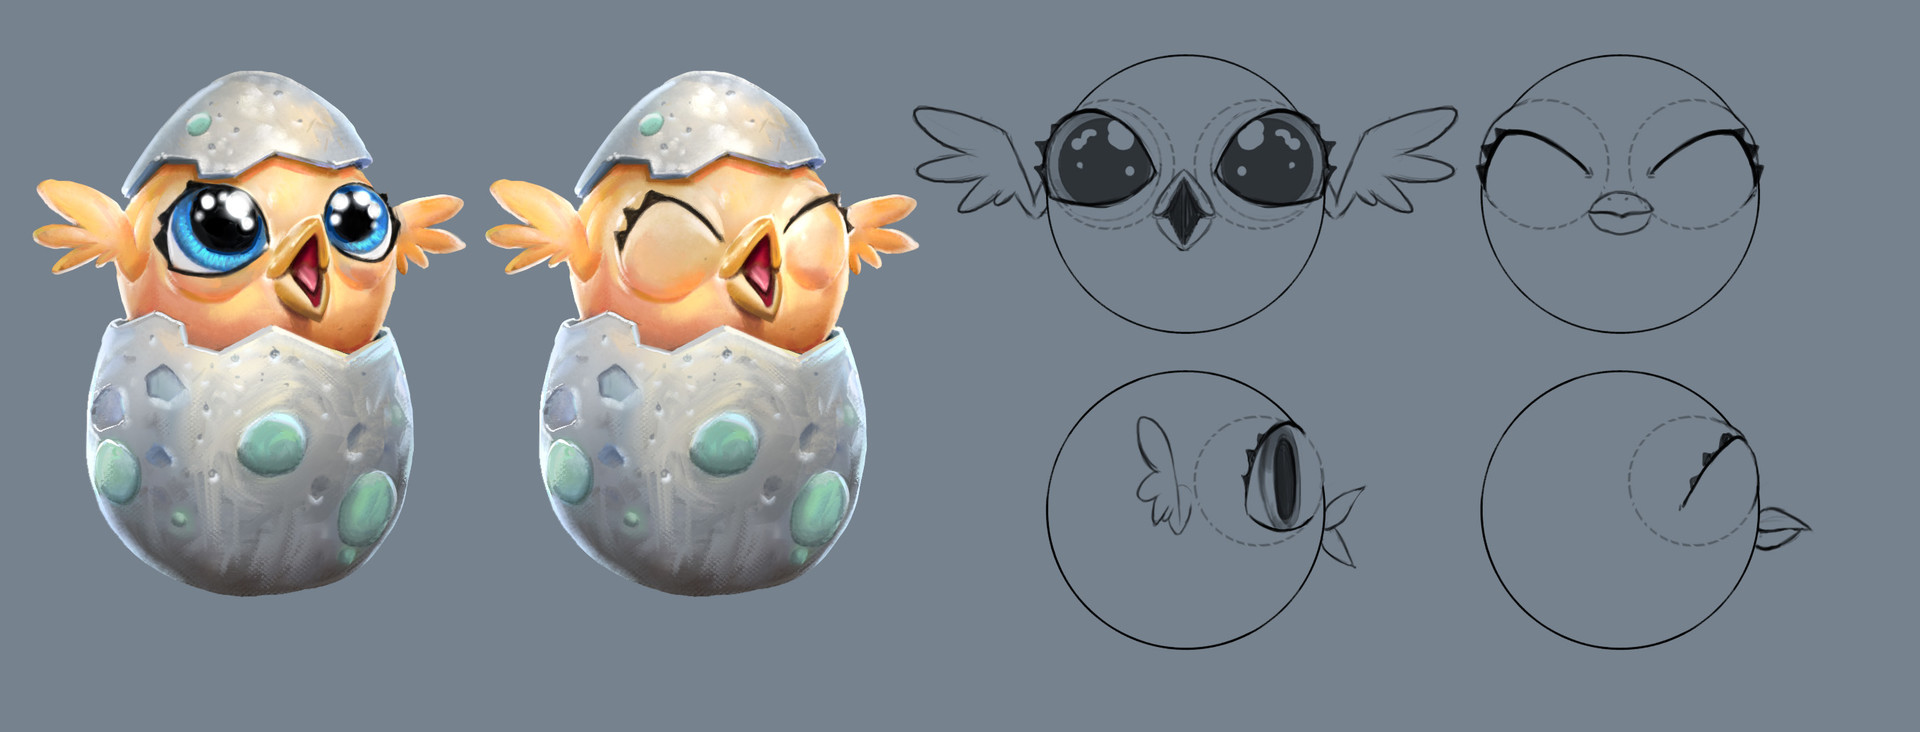 Loic liok bramoulle stoneage bird design v04 003